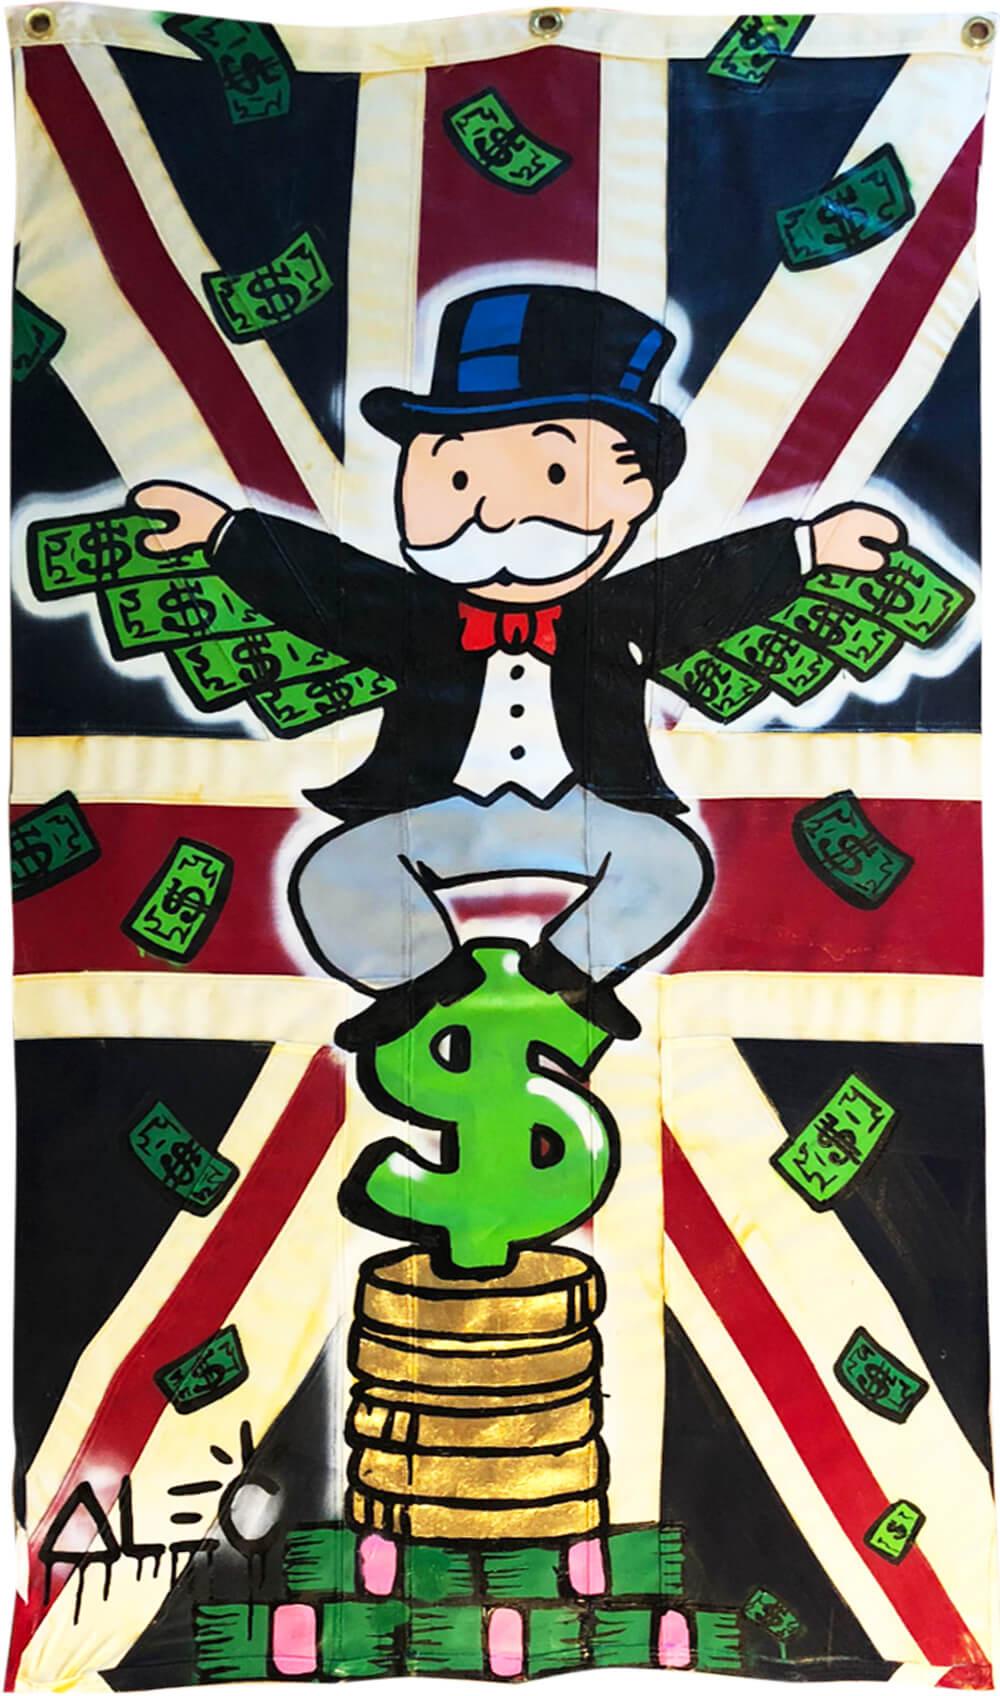 Monopoly Money Wings On UK Flag - Eden Gallery